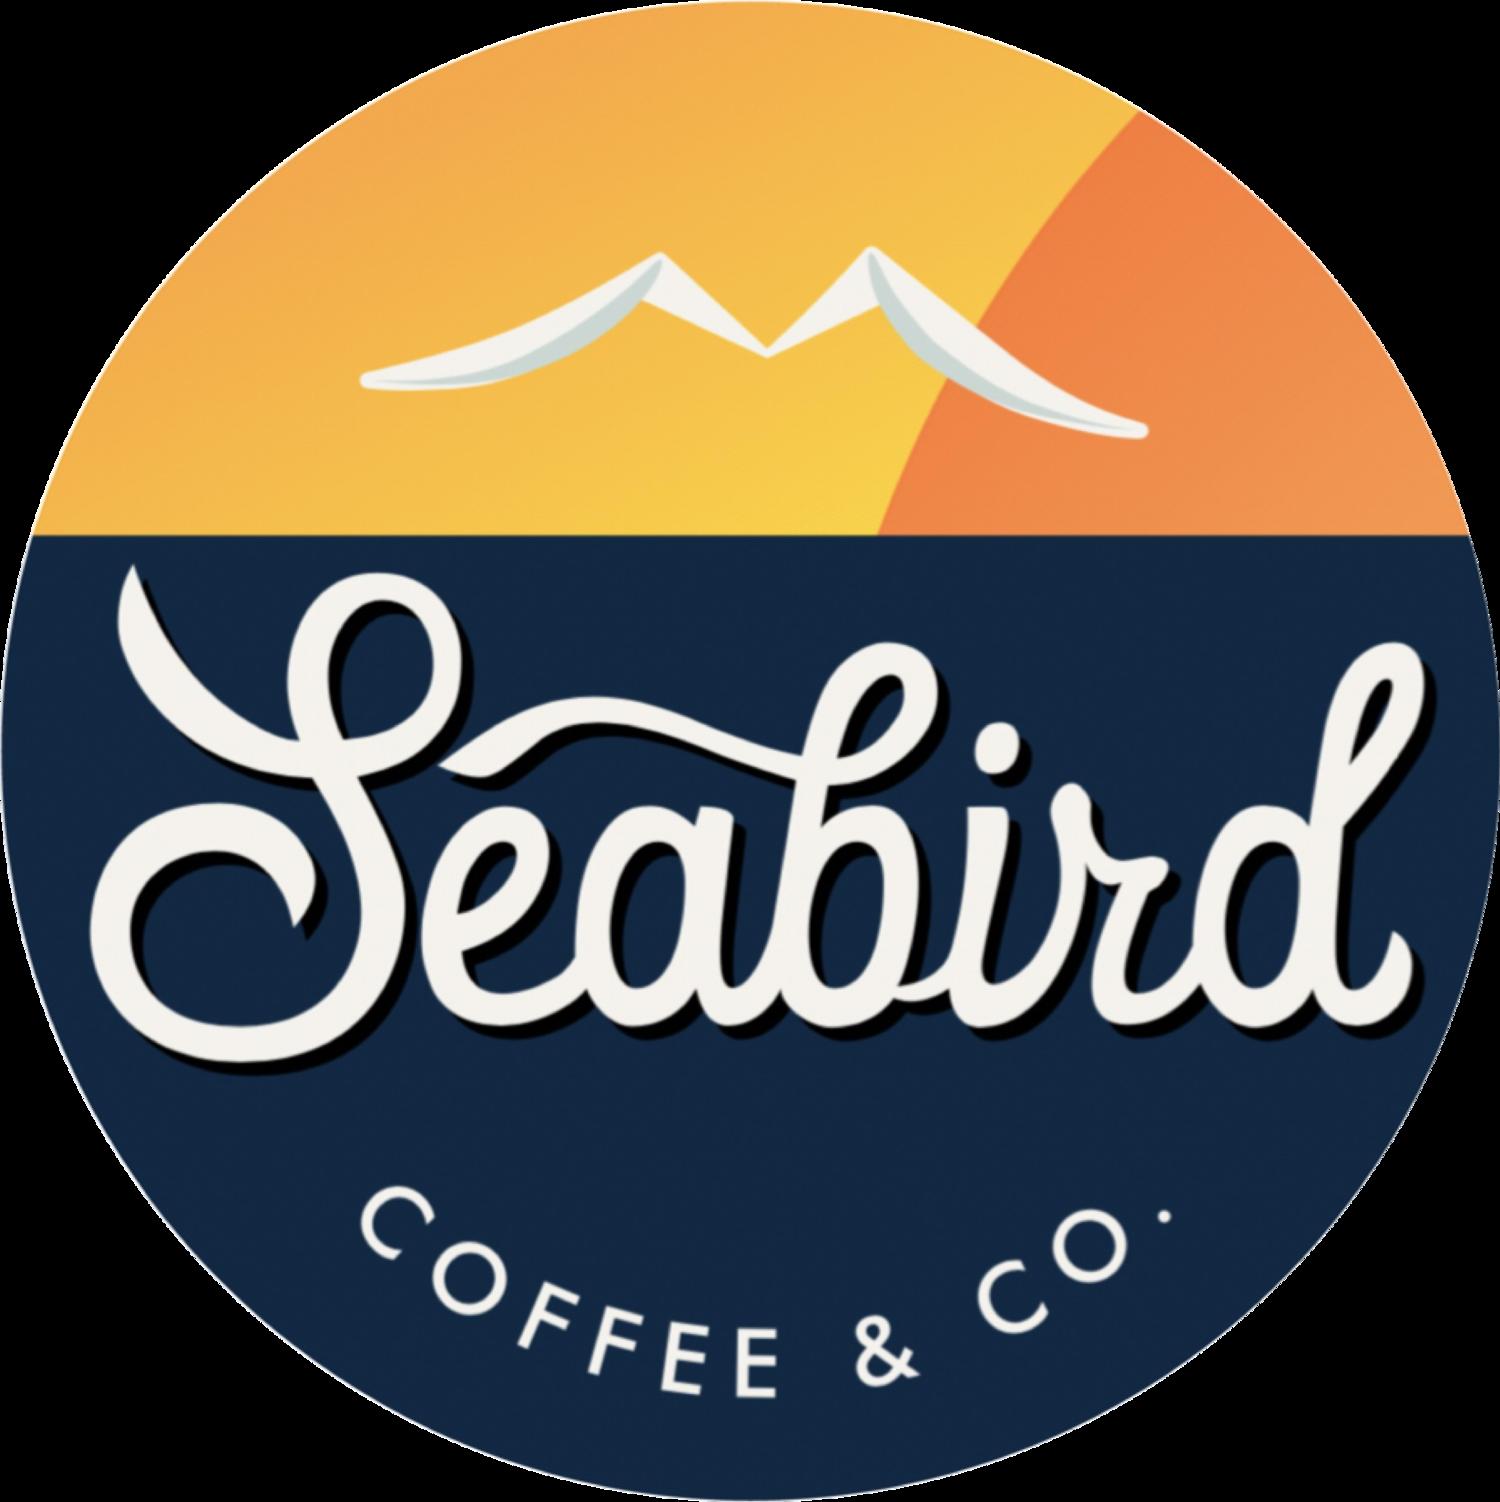 Seabird Logo.png